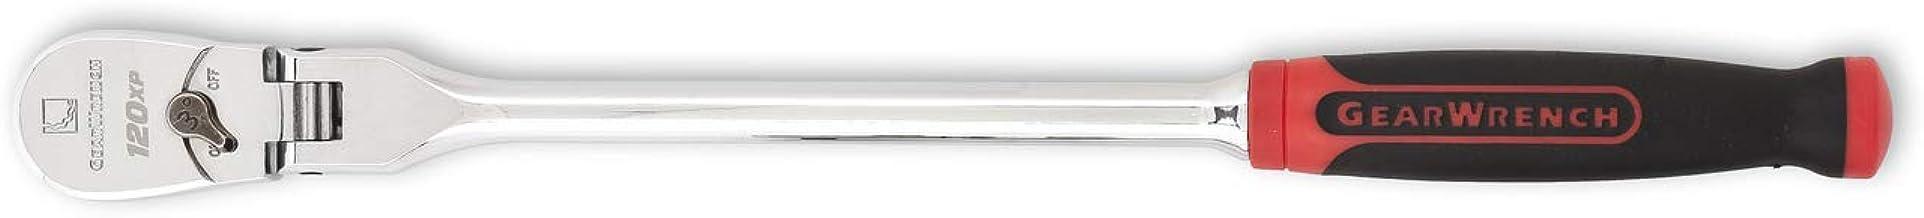 "GEARWRENCH 3/8"" 120XP Dual Material Flex Head Teardrop Ratchet 13-1/2"" – 81210P"